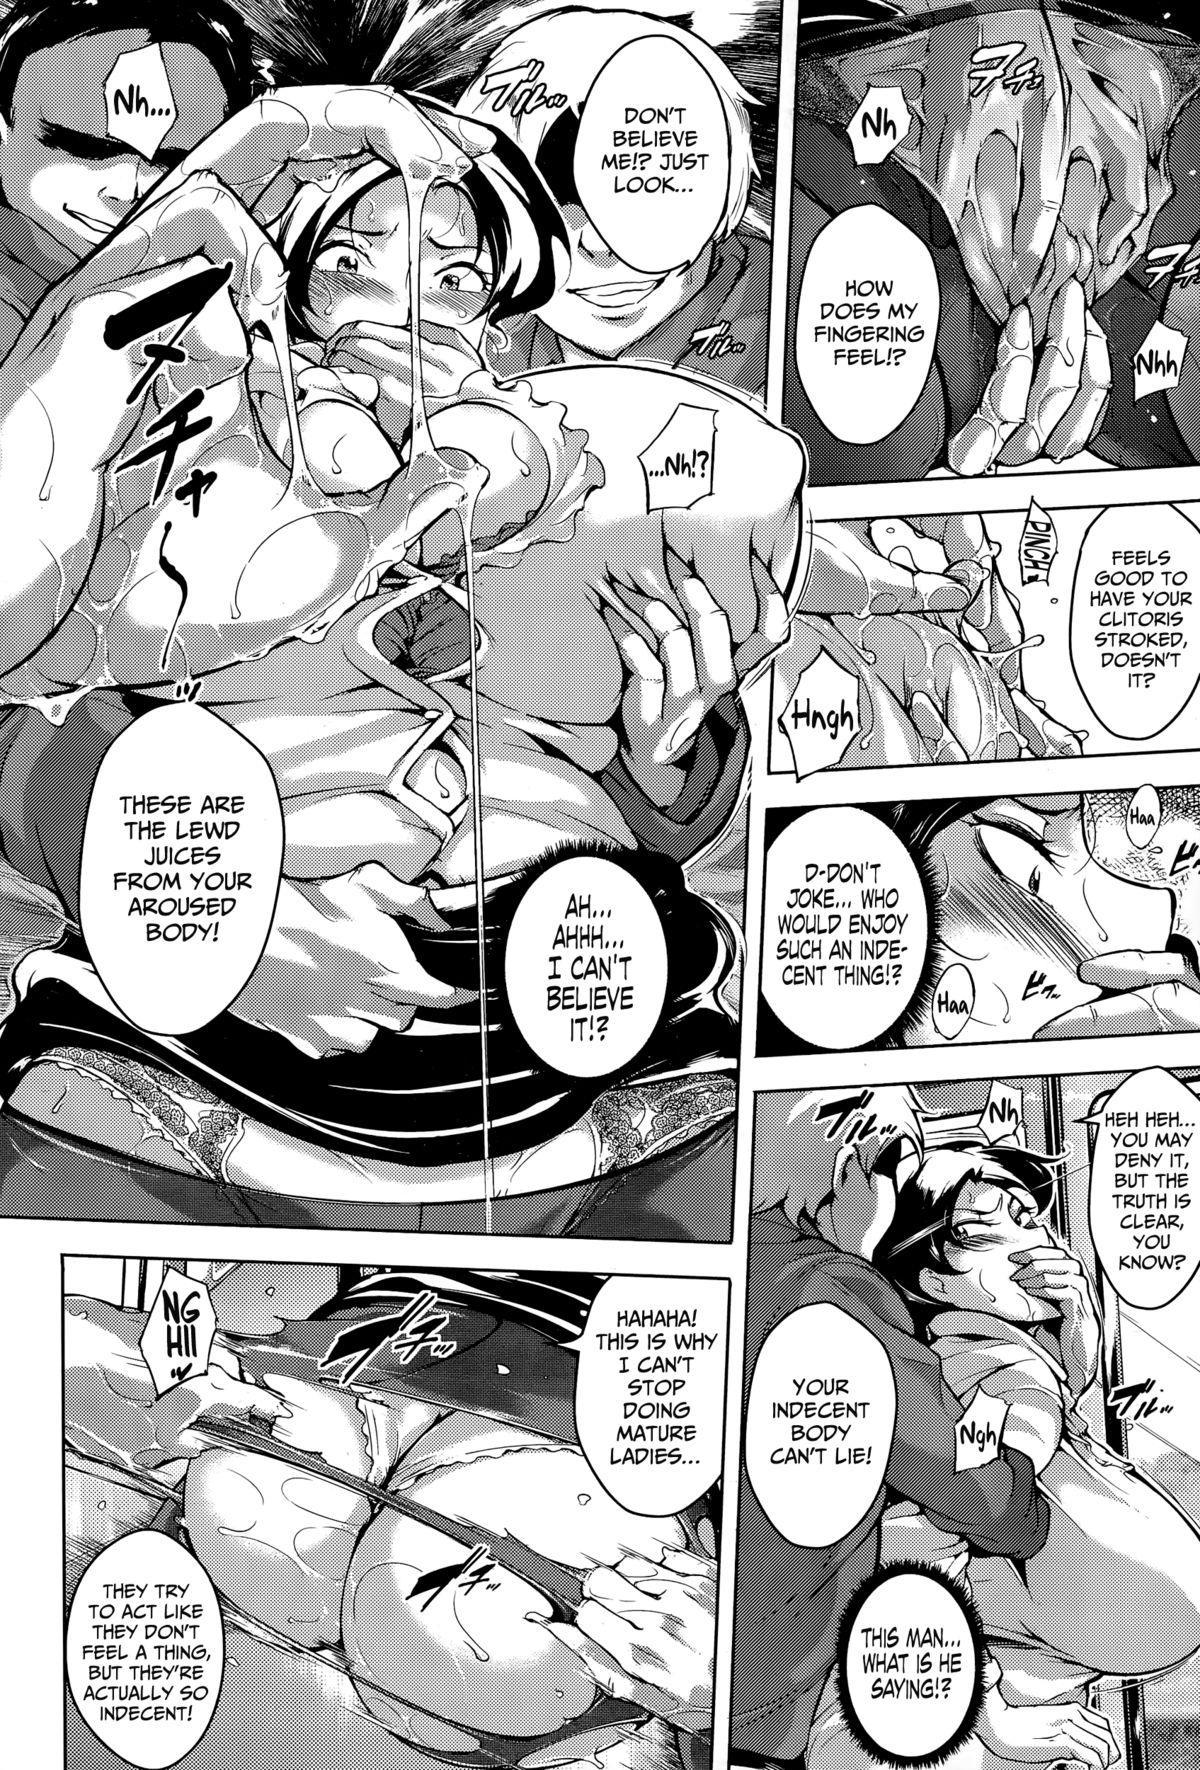 Ryoujyoku Chikan Kyuukou | Rapist Molester Express 3